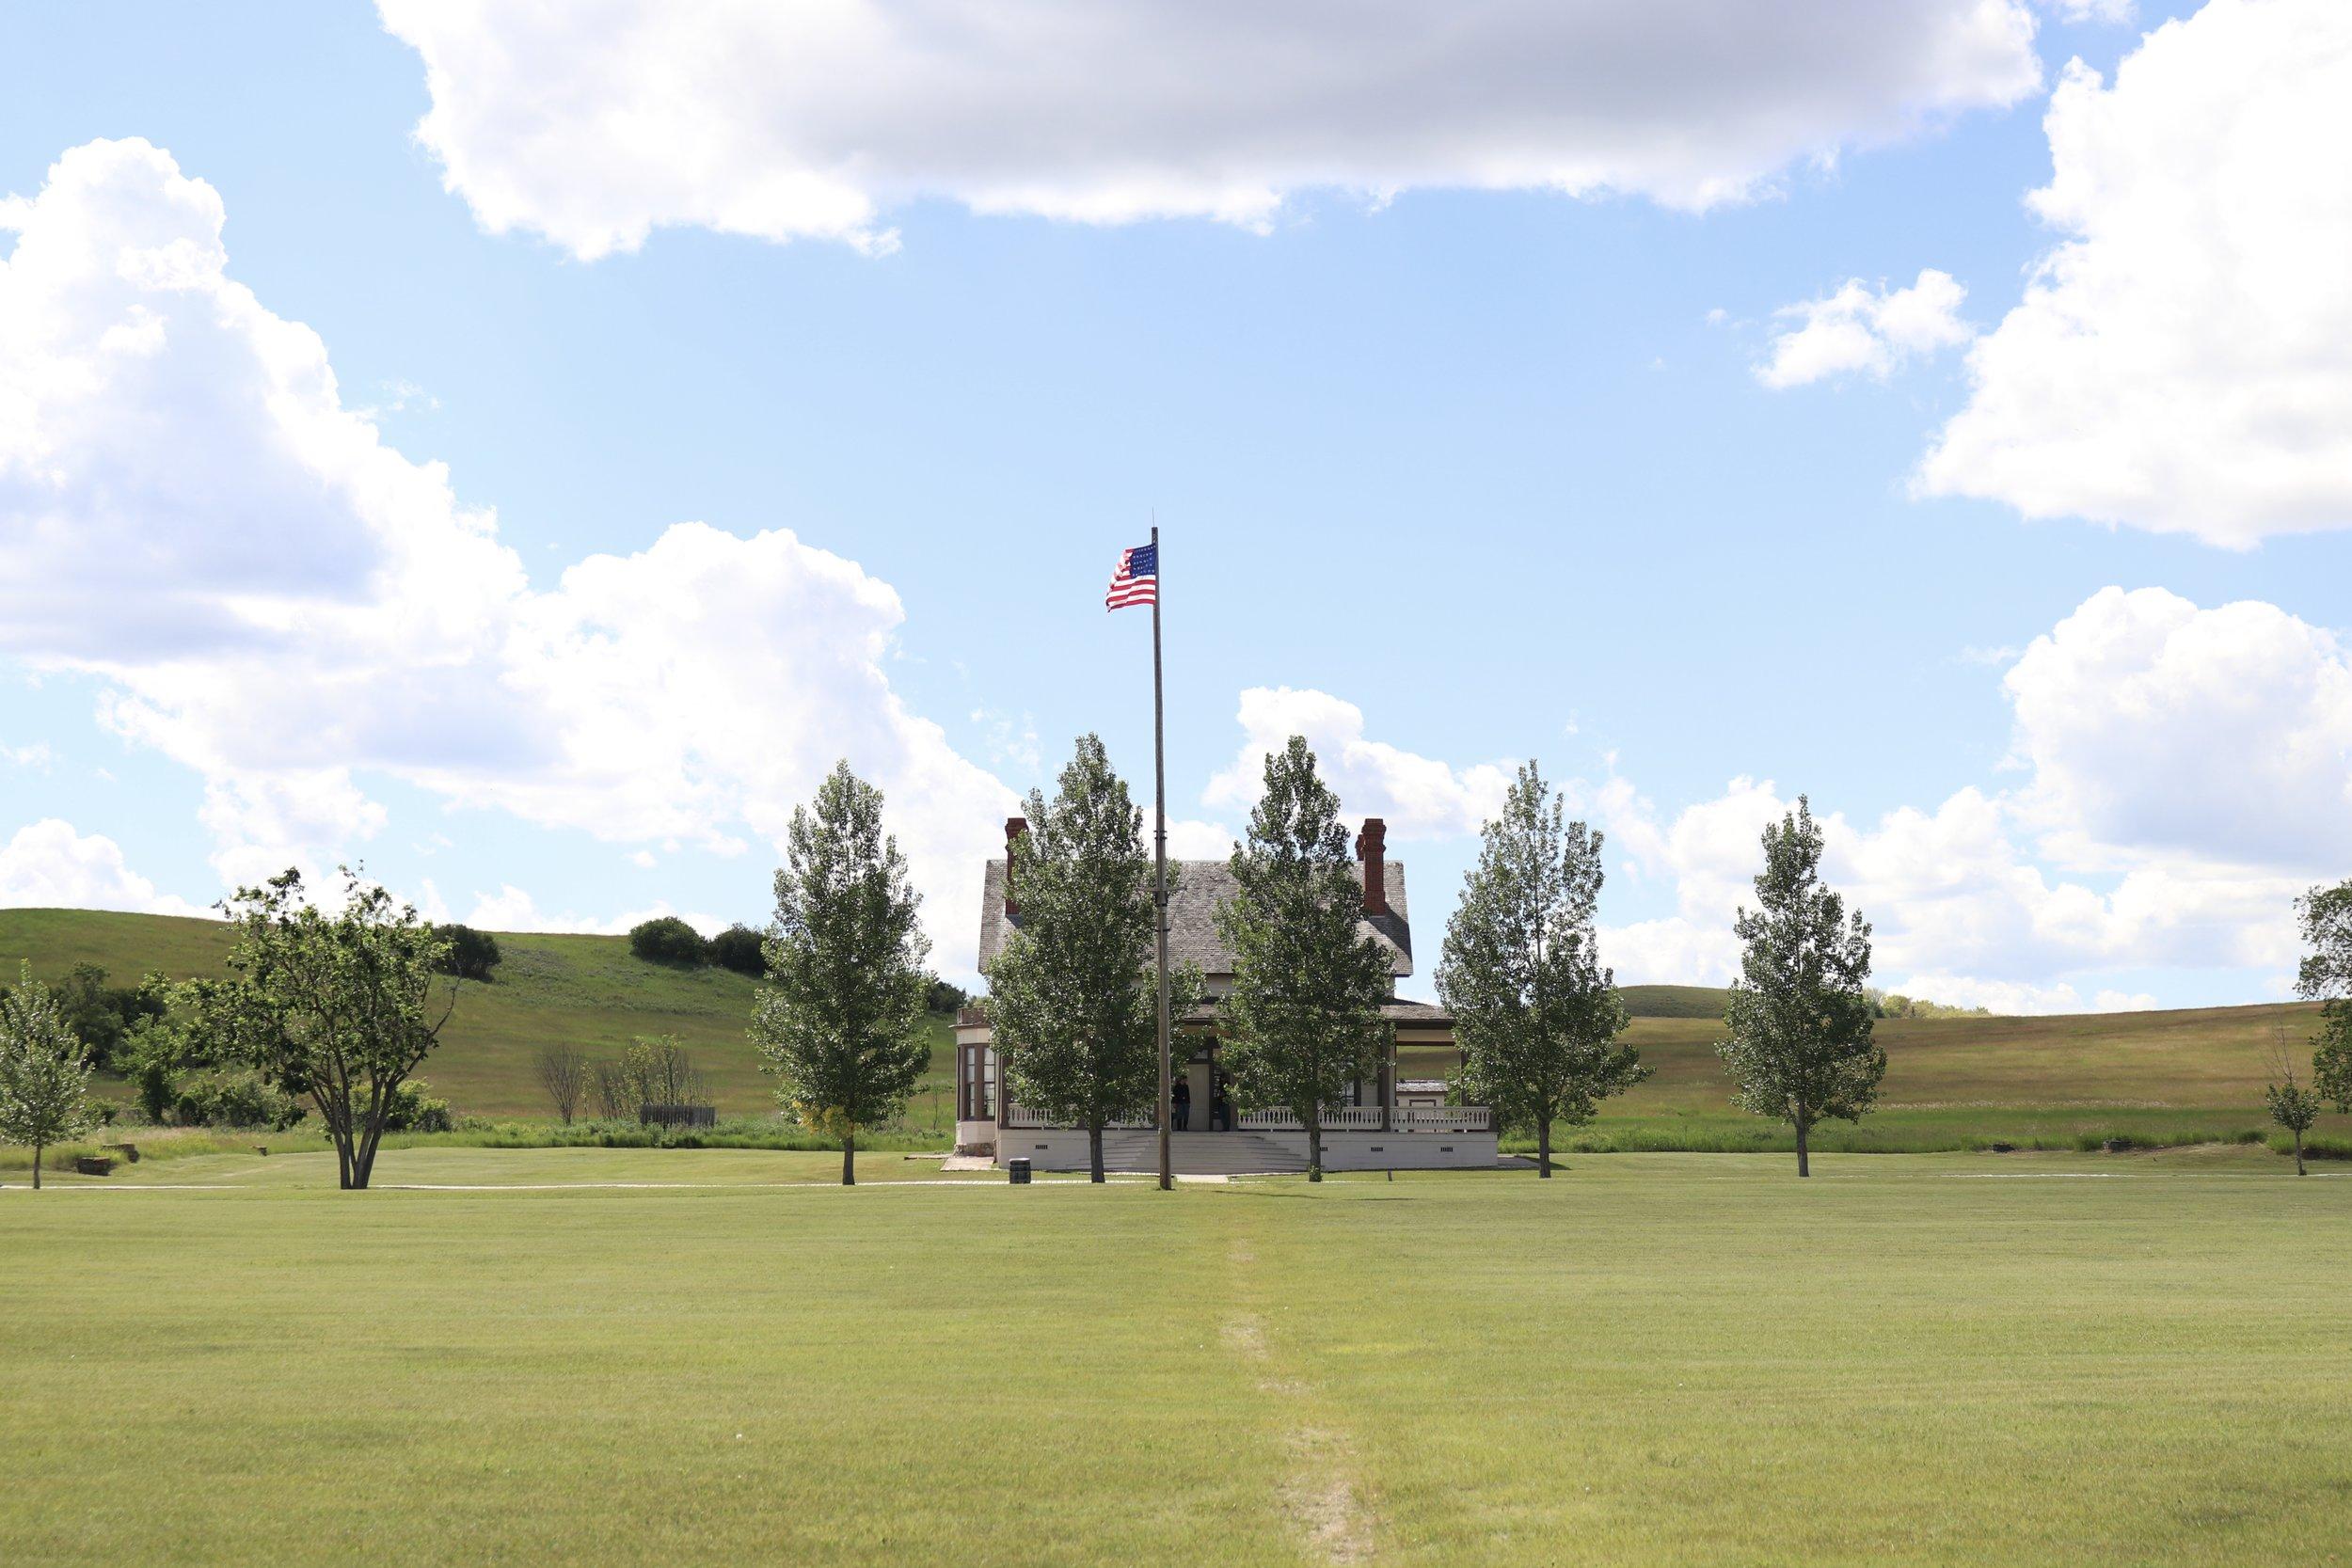 Custer's House at Fort Abraham Lincoln, North Dakota